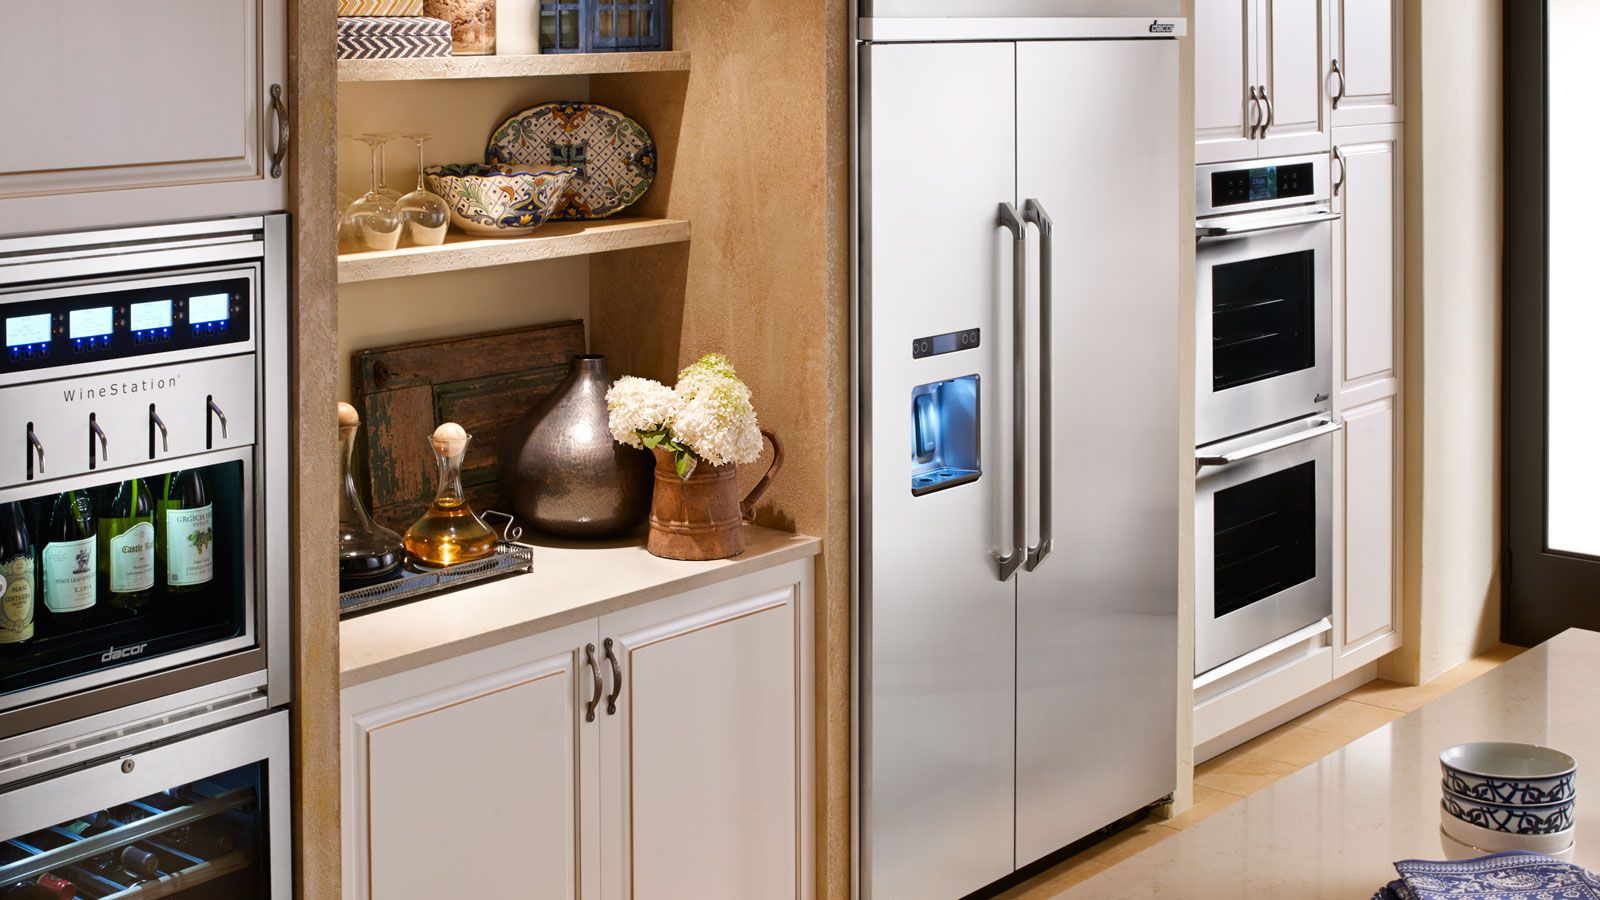 Pin By Ana Puig On Kitchen Laundry Kitchen Remodel Kitchen Kitchen Appliances